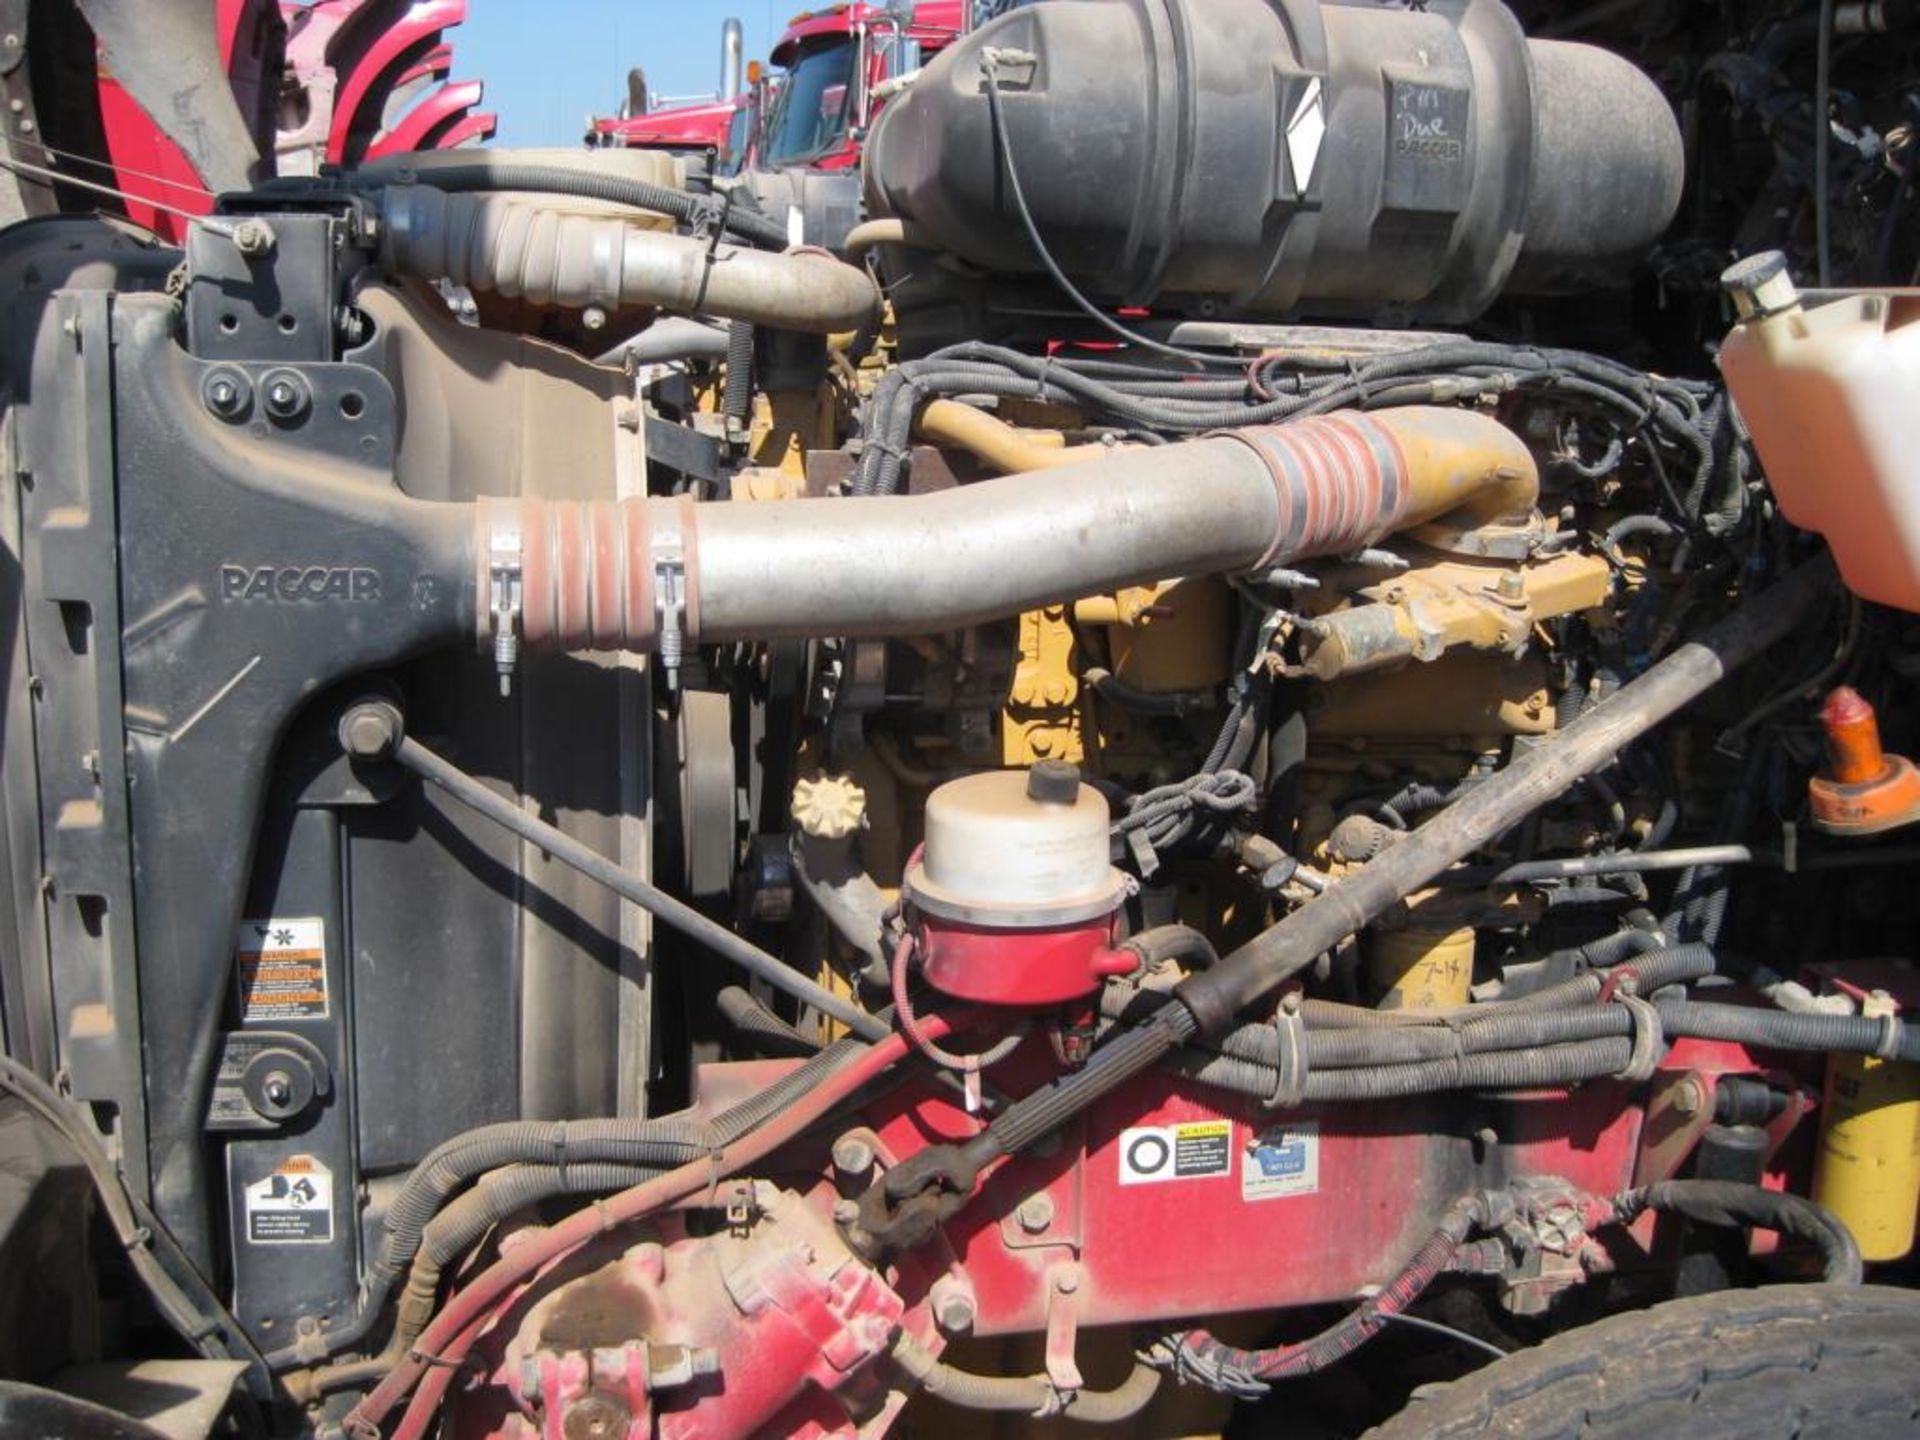 Kenworth Truck - Image 20 of 21